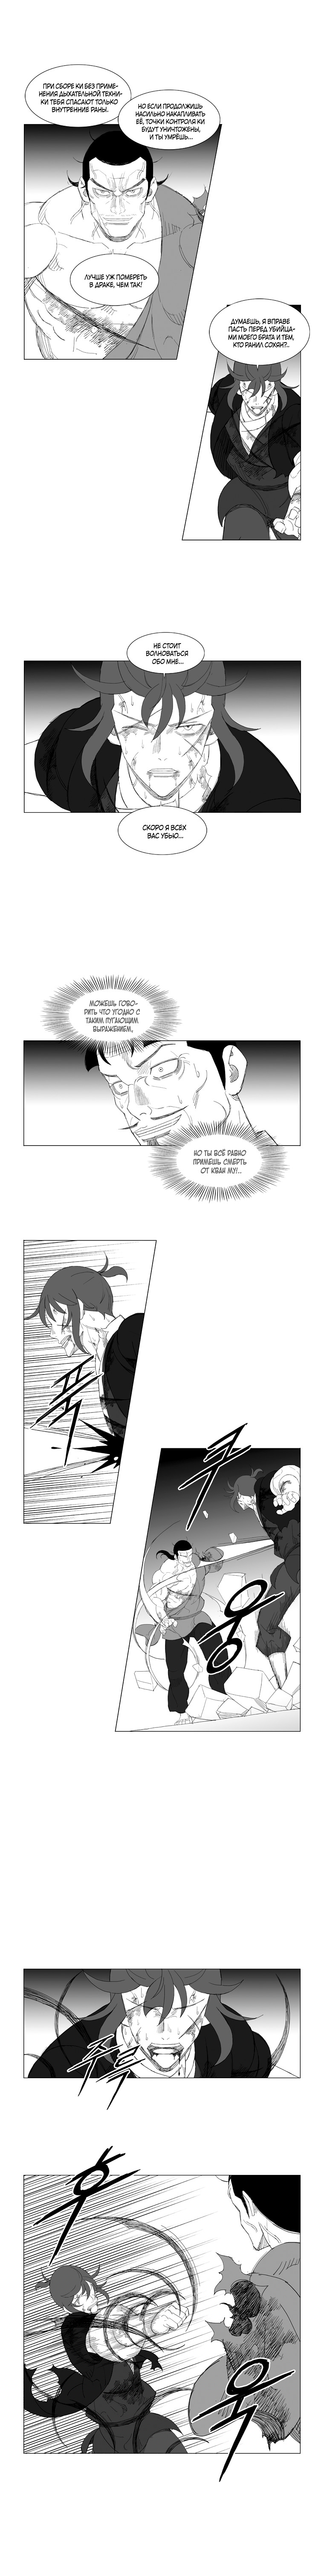 https://r2.ninemanga.com/comics/pic3/39/28263/1276831/1542307700192.jpg Page 4